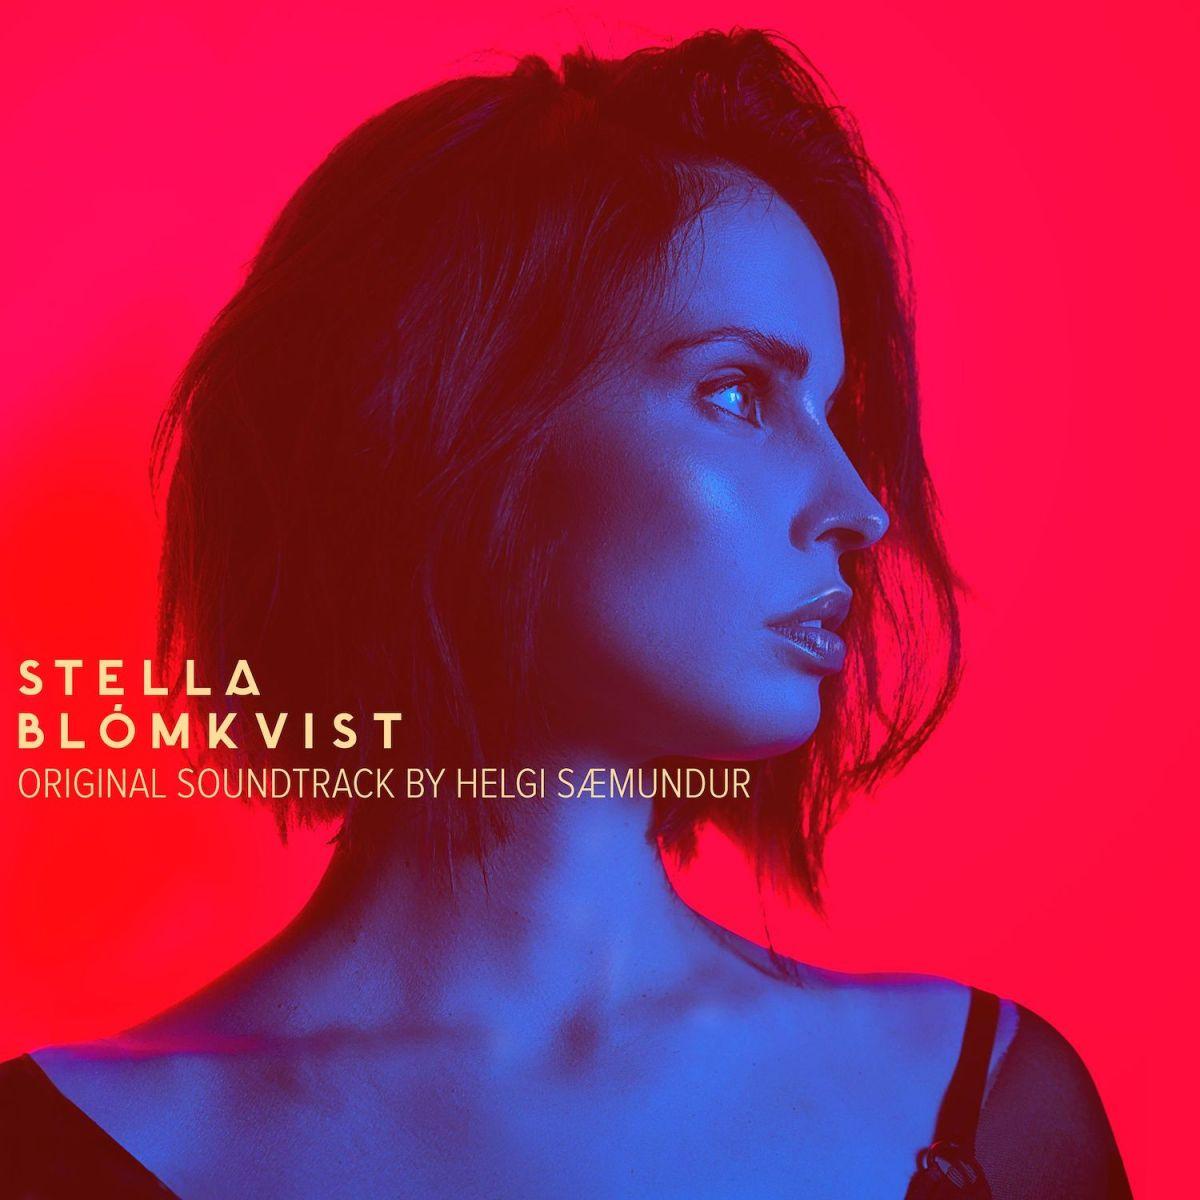 Helgi Sæmundur Crafts Alluring Synth Cues for 'Stella Blomkvist'